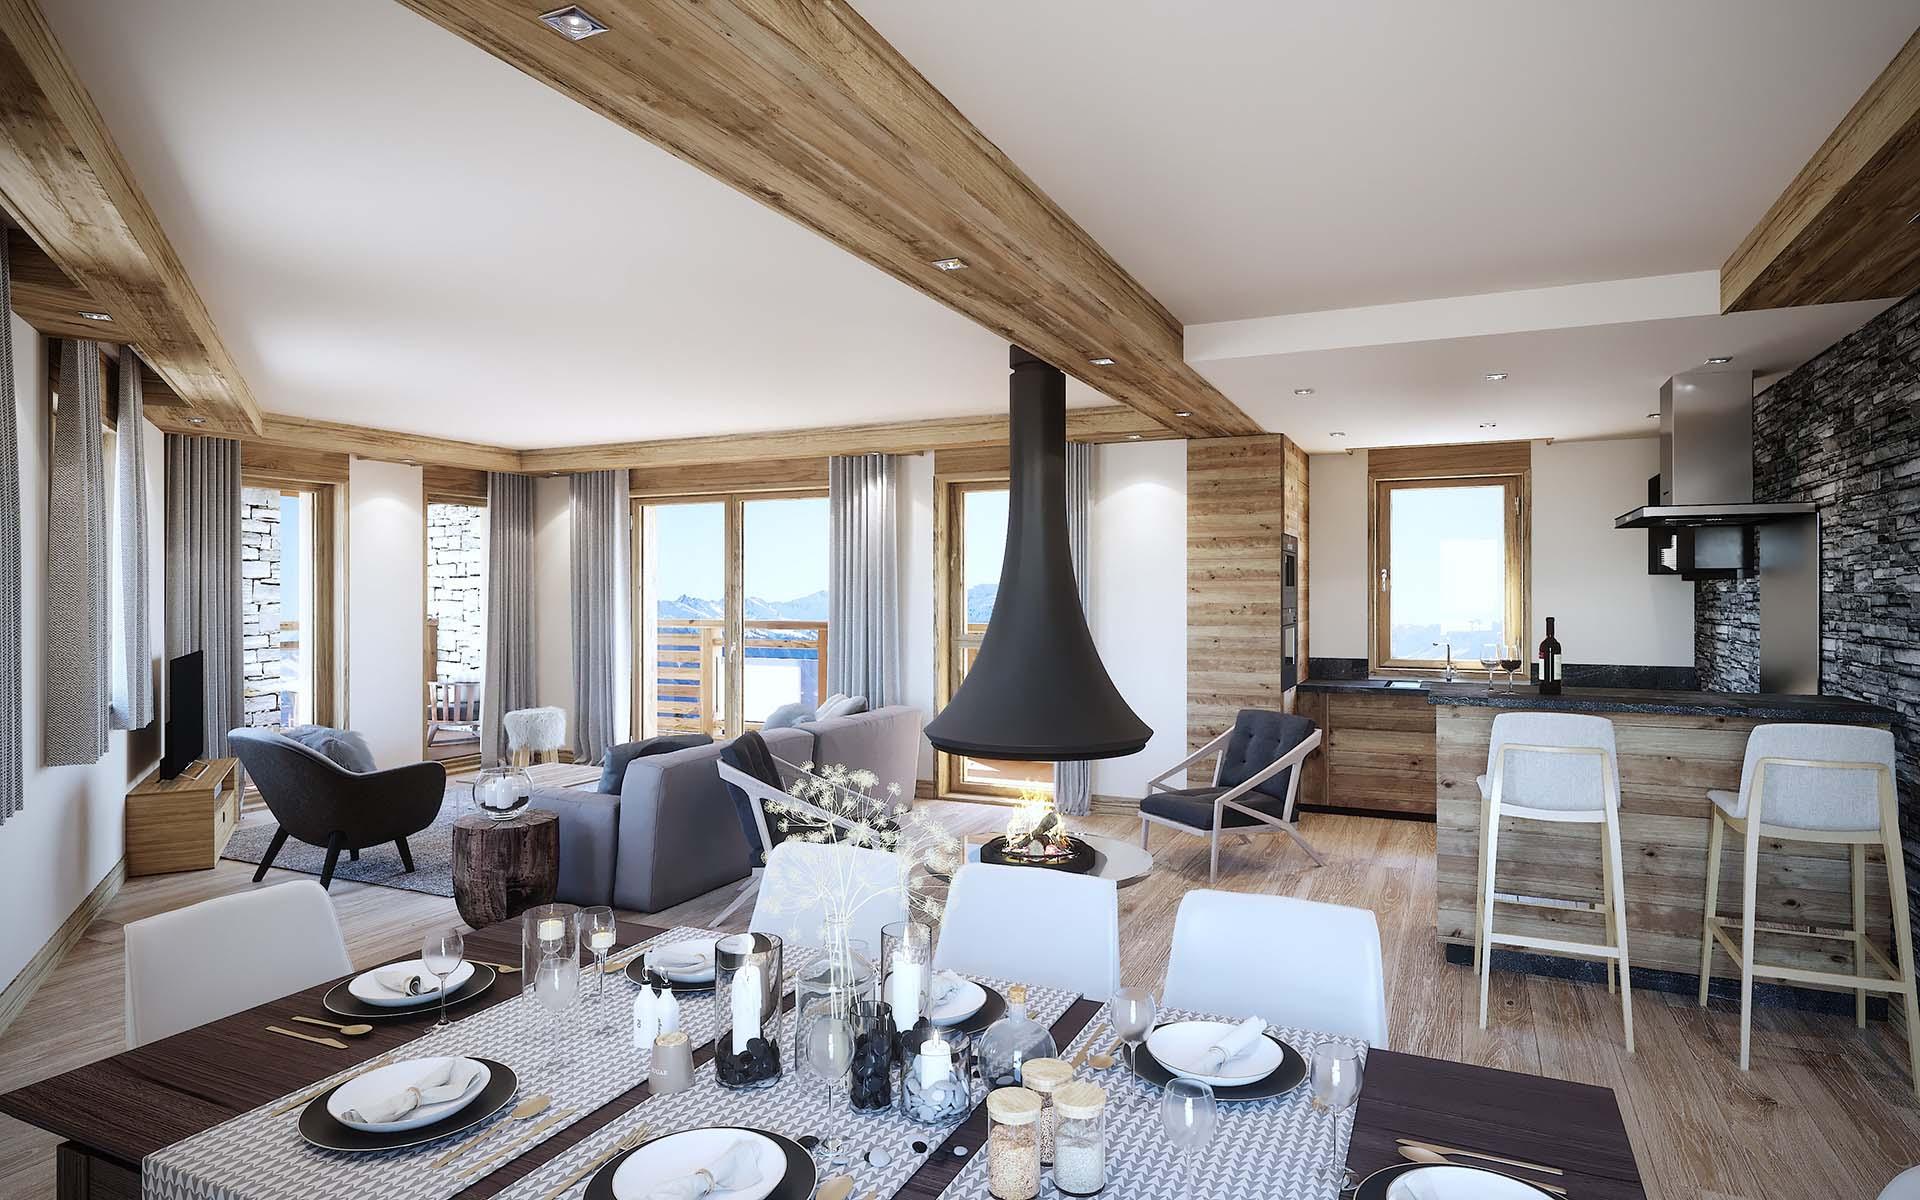 3D architect studio : creation 3D photo of a luxurious apartment.